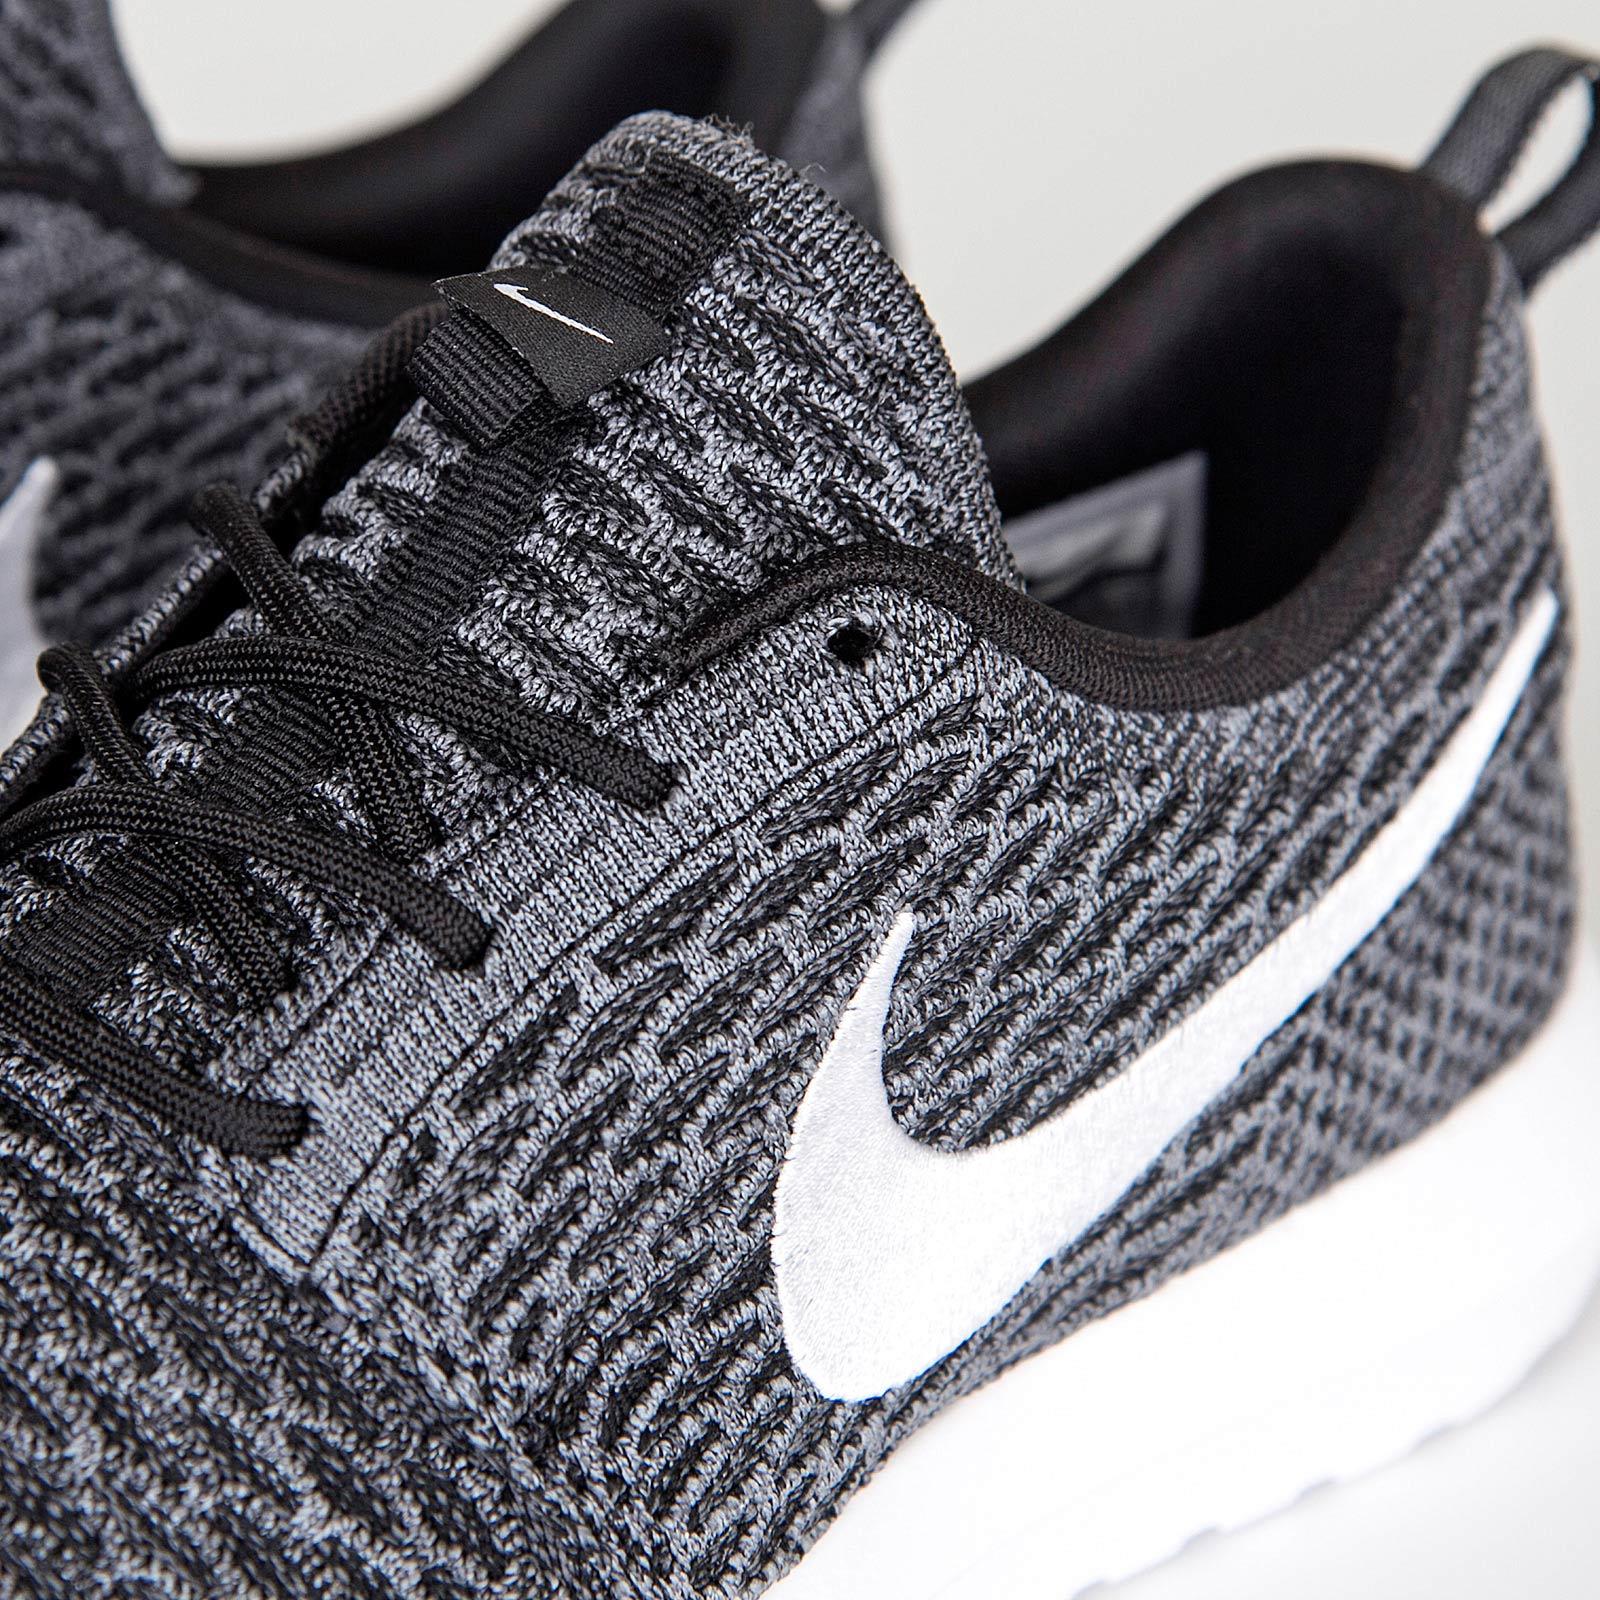 a35237cbbc44 Nike Roshe NM Flyknit - 677243-010 - Sneakersnstuff